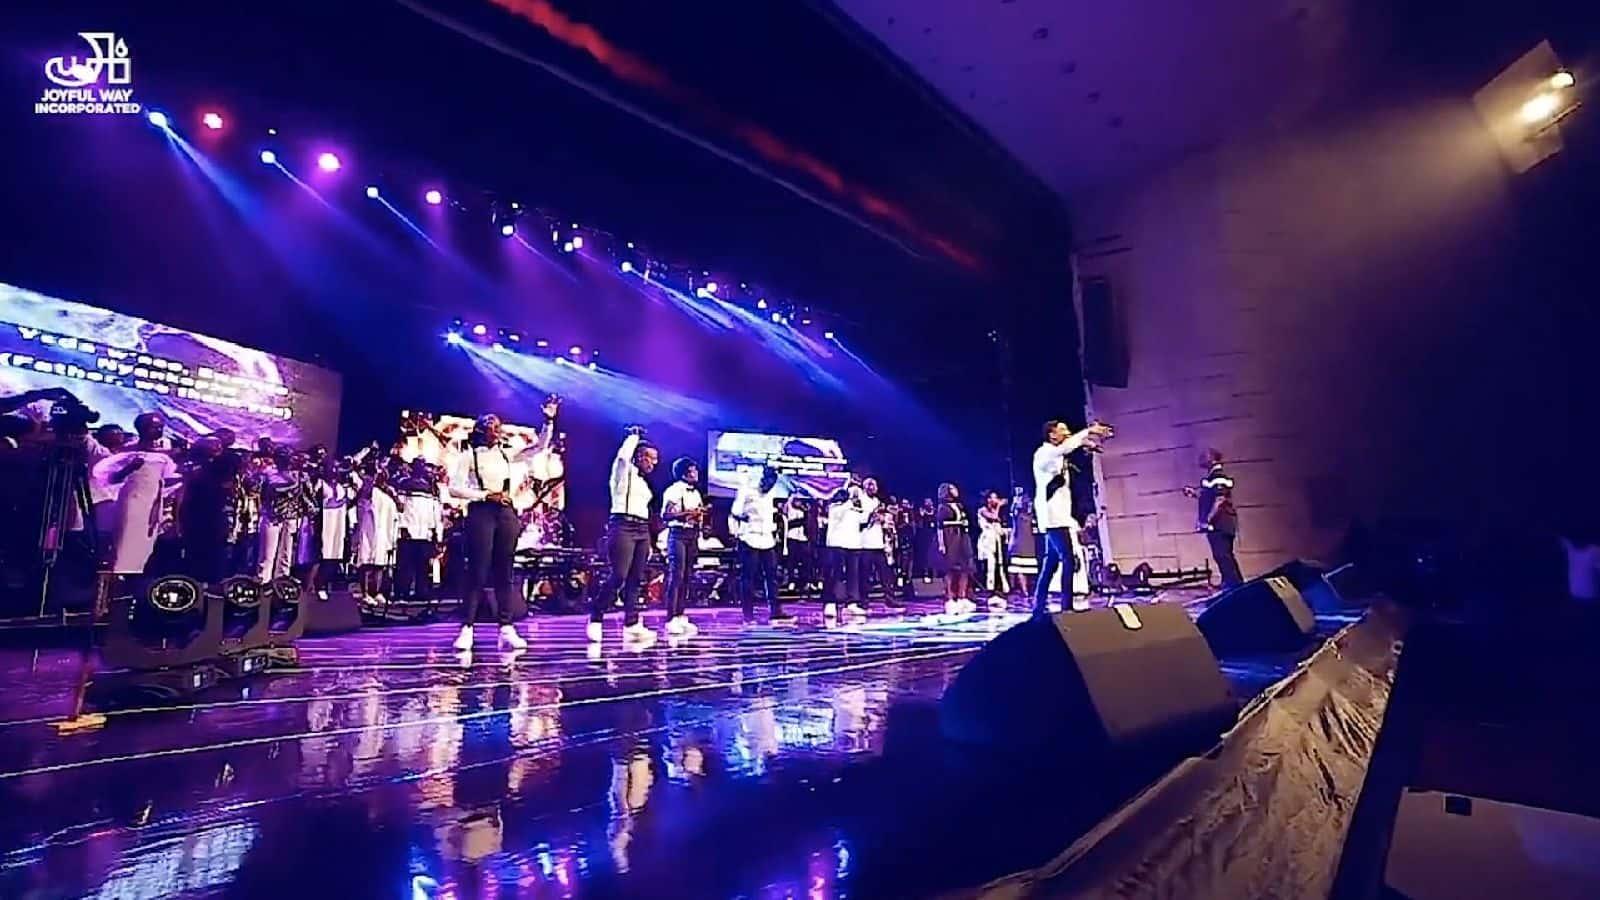 Worship Medley (Live) - Joyful Way Inc. at Explosion of Joy 2019